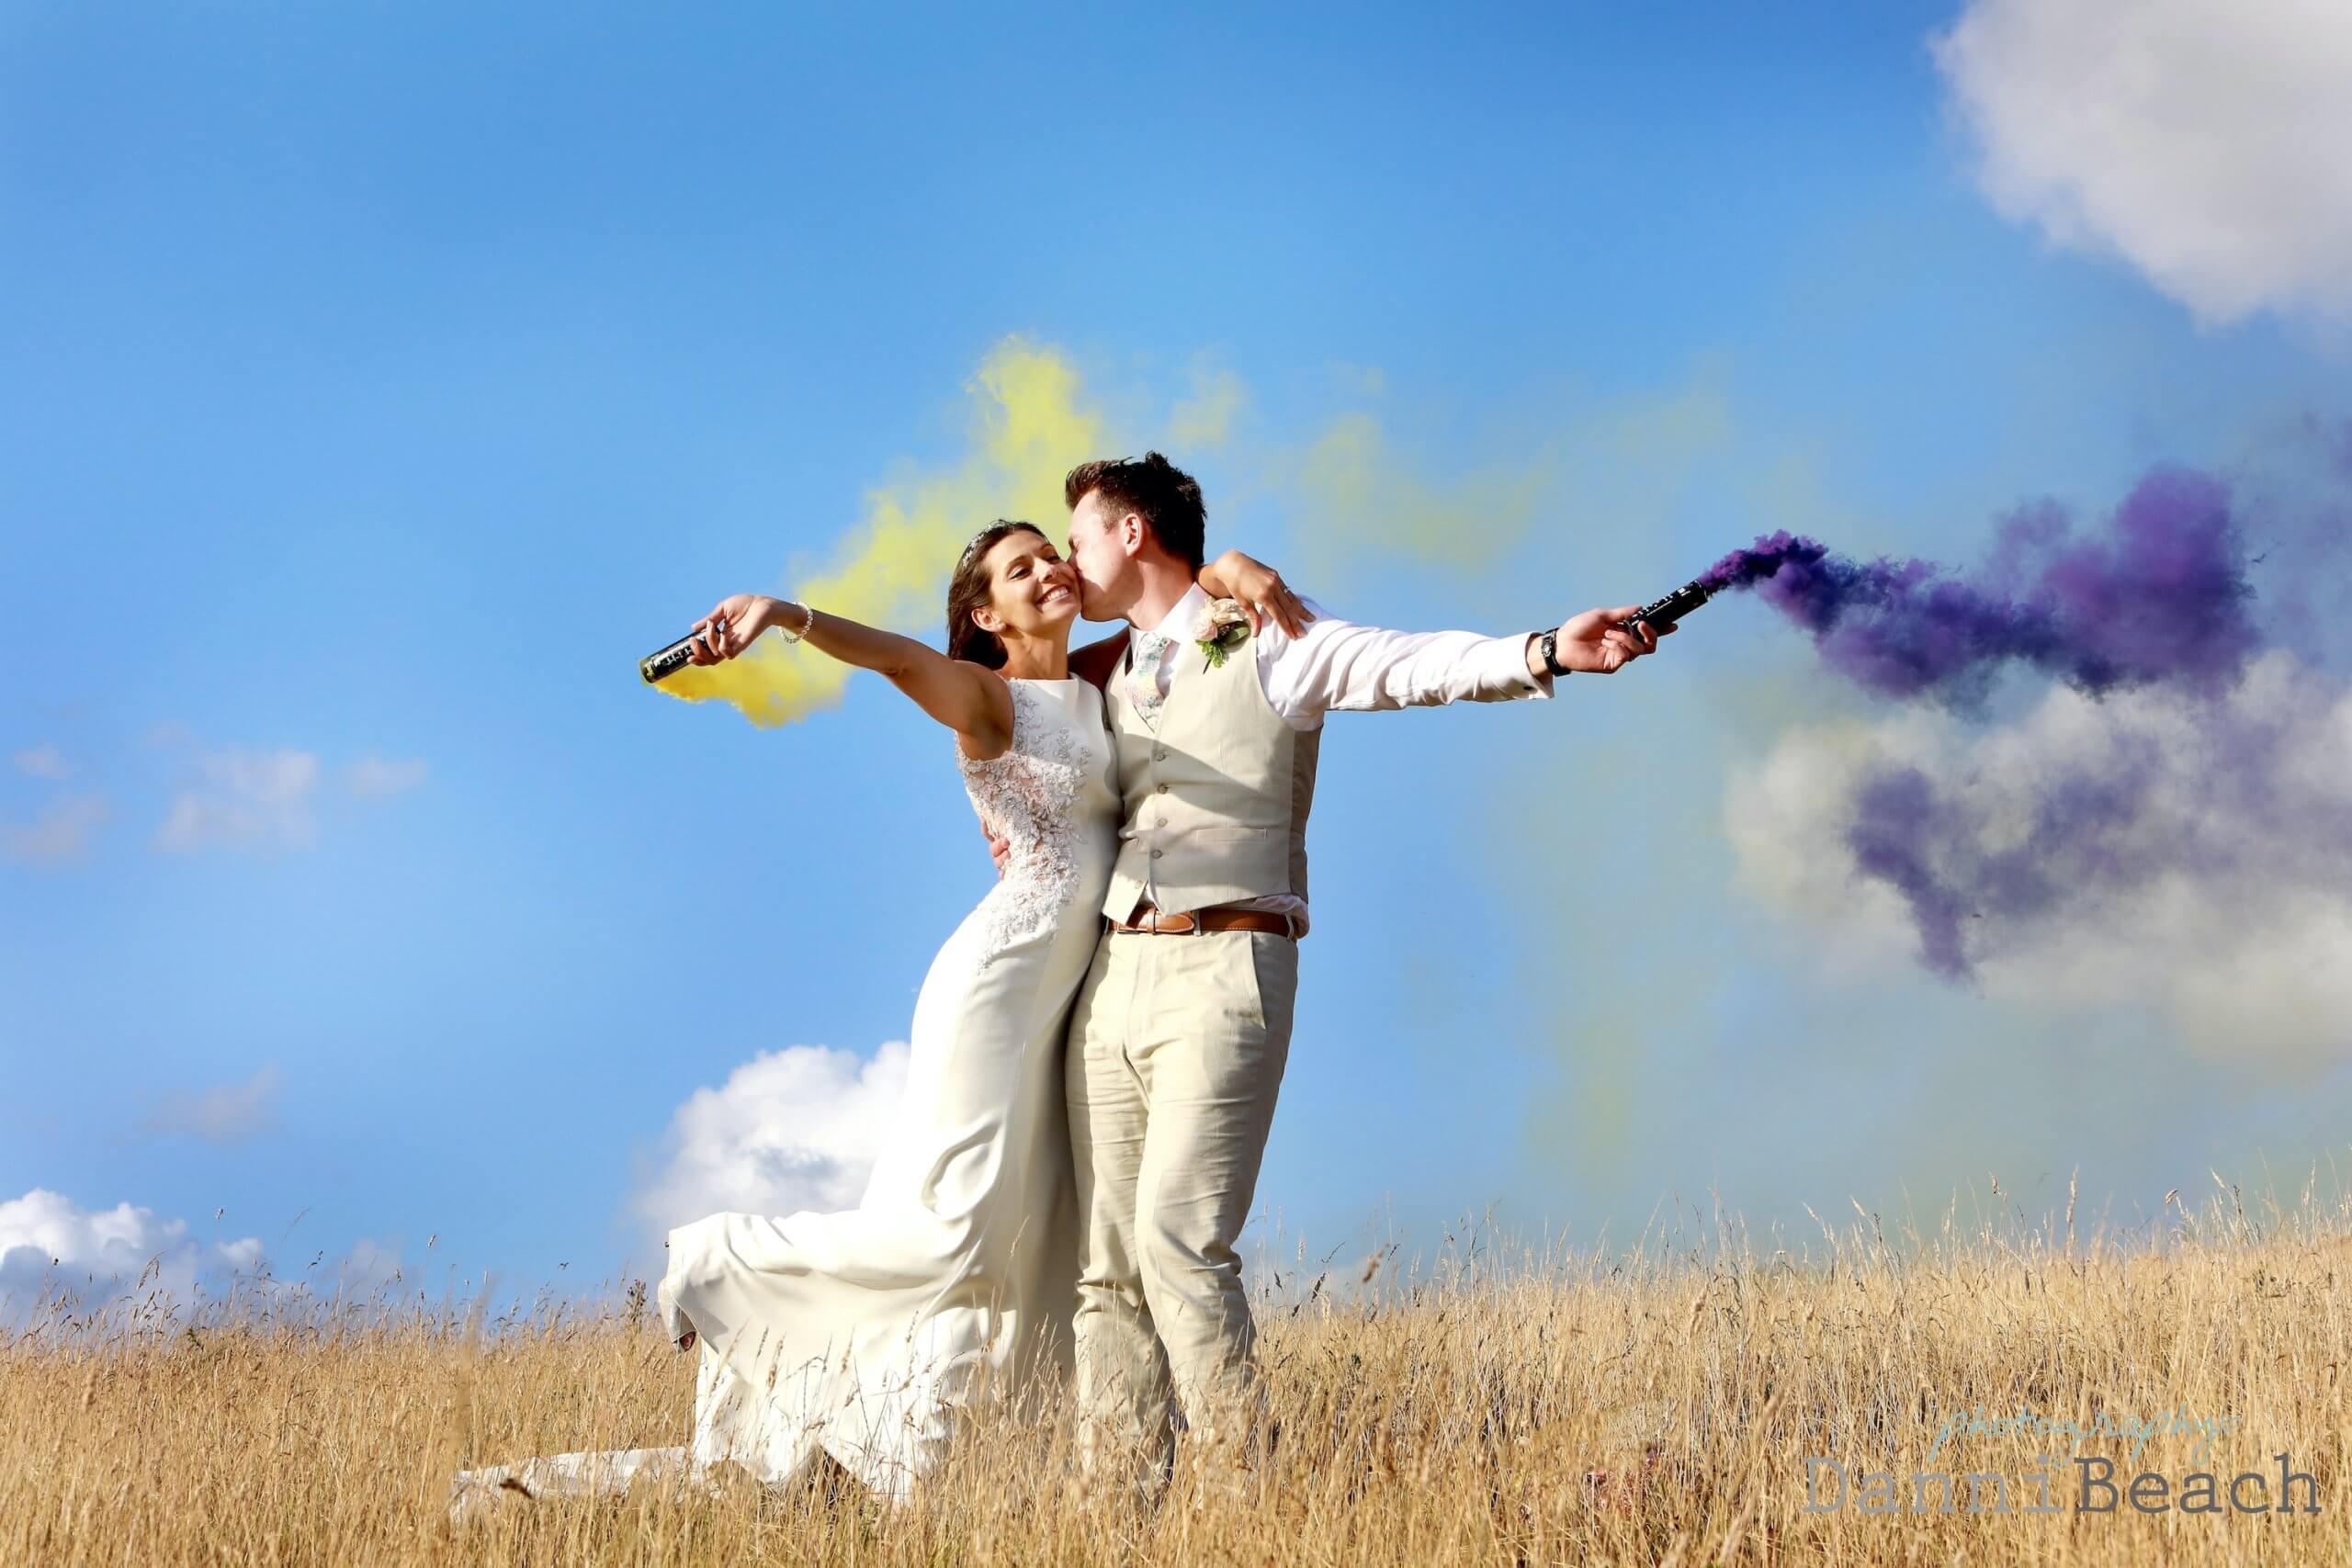 Sussex wedding photographer Upwaltham BArns